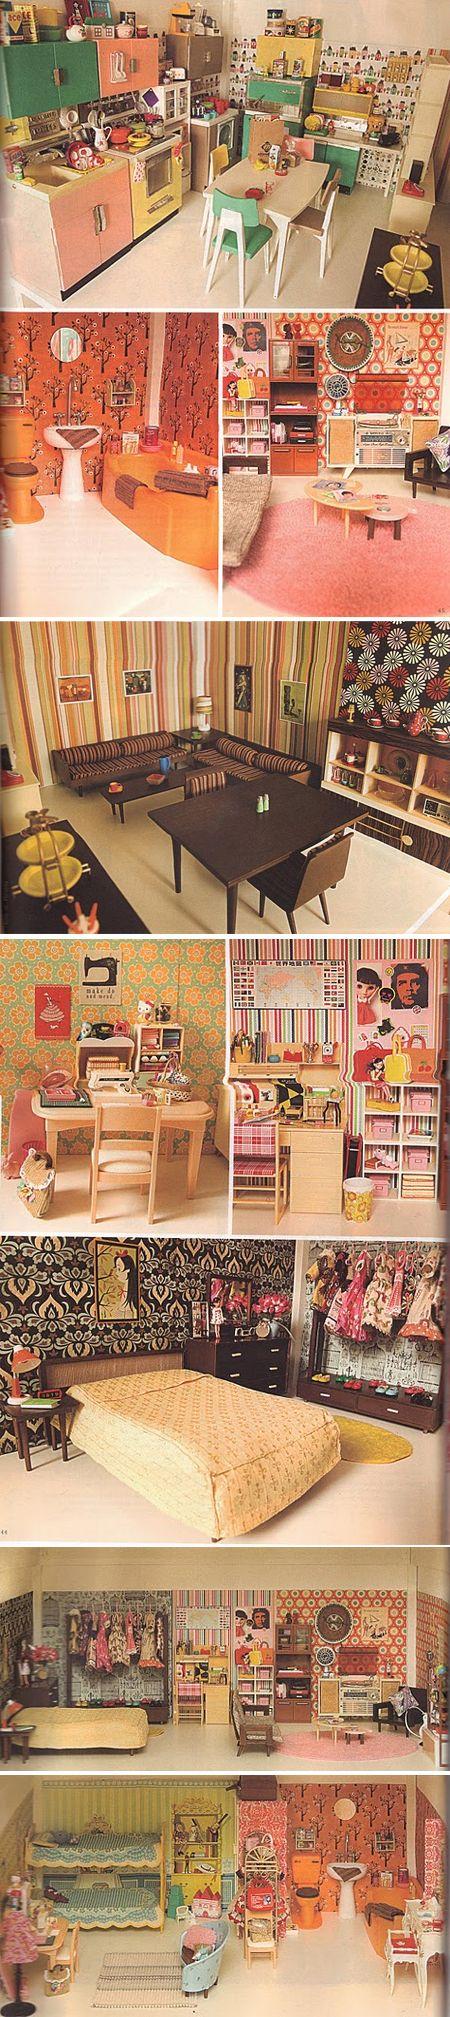 Fantastic Wallpaper and Mid Century Furniture georgiasmith Hip